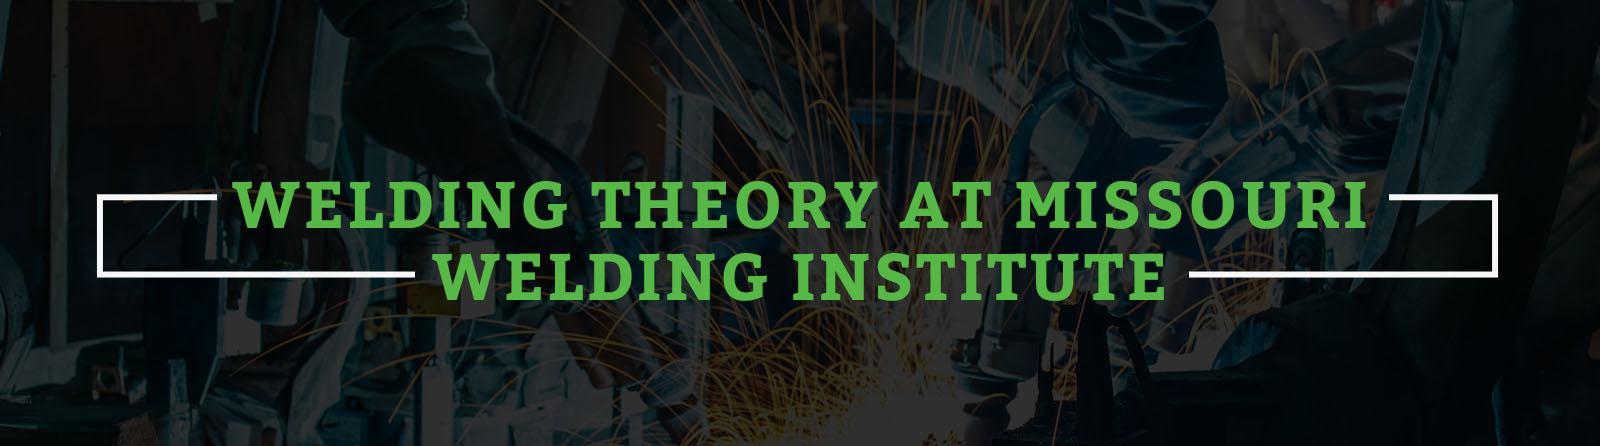 Welding Theory At Missouri Welding Institute